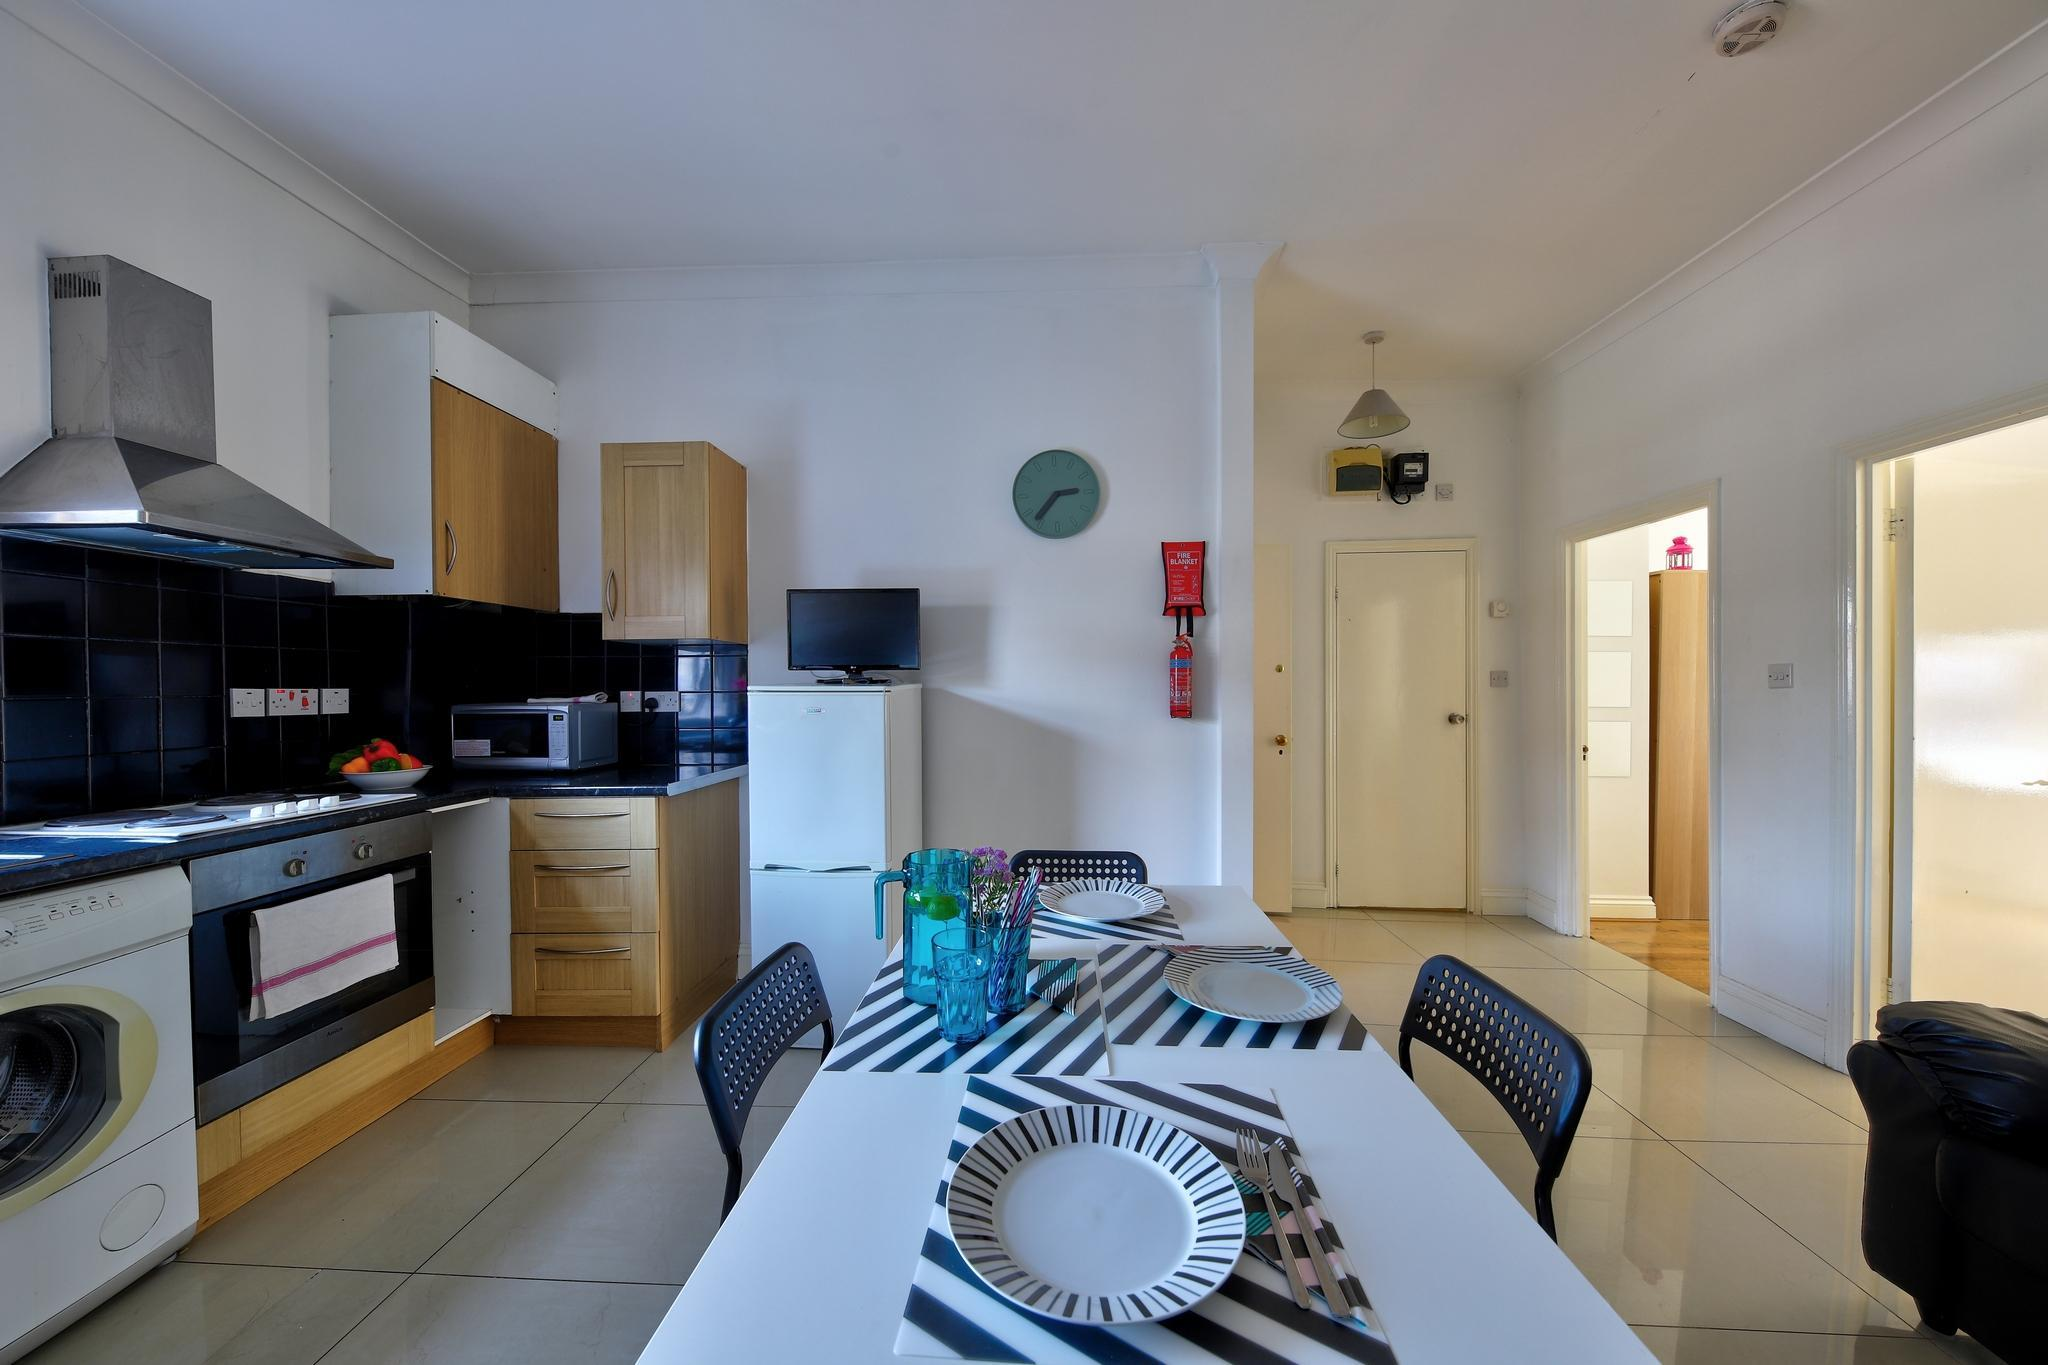 2 Bedroom Apartment #30.2B Reviews